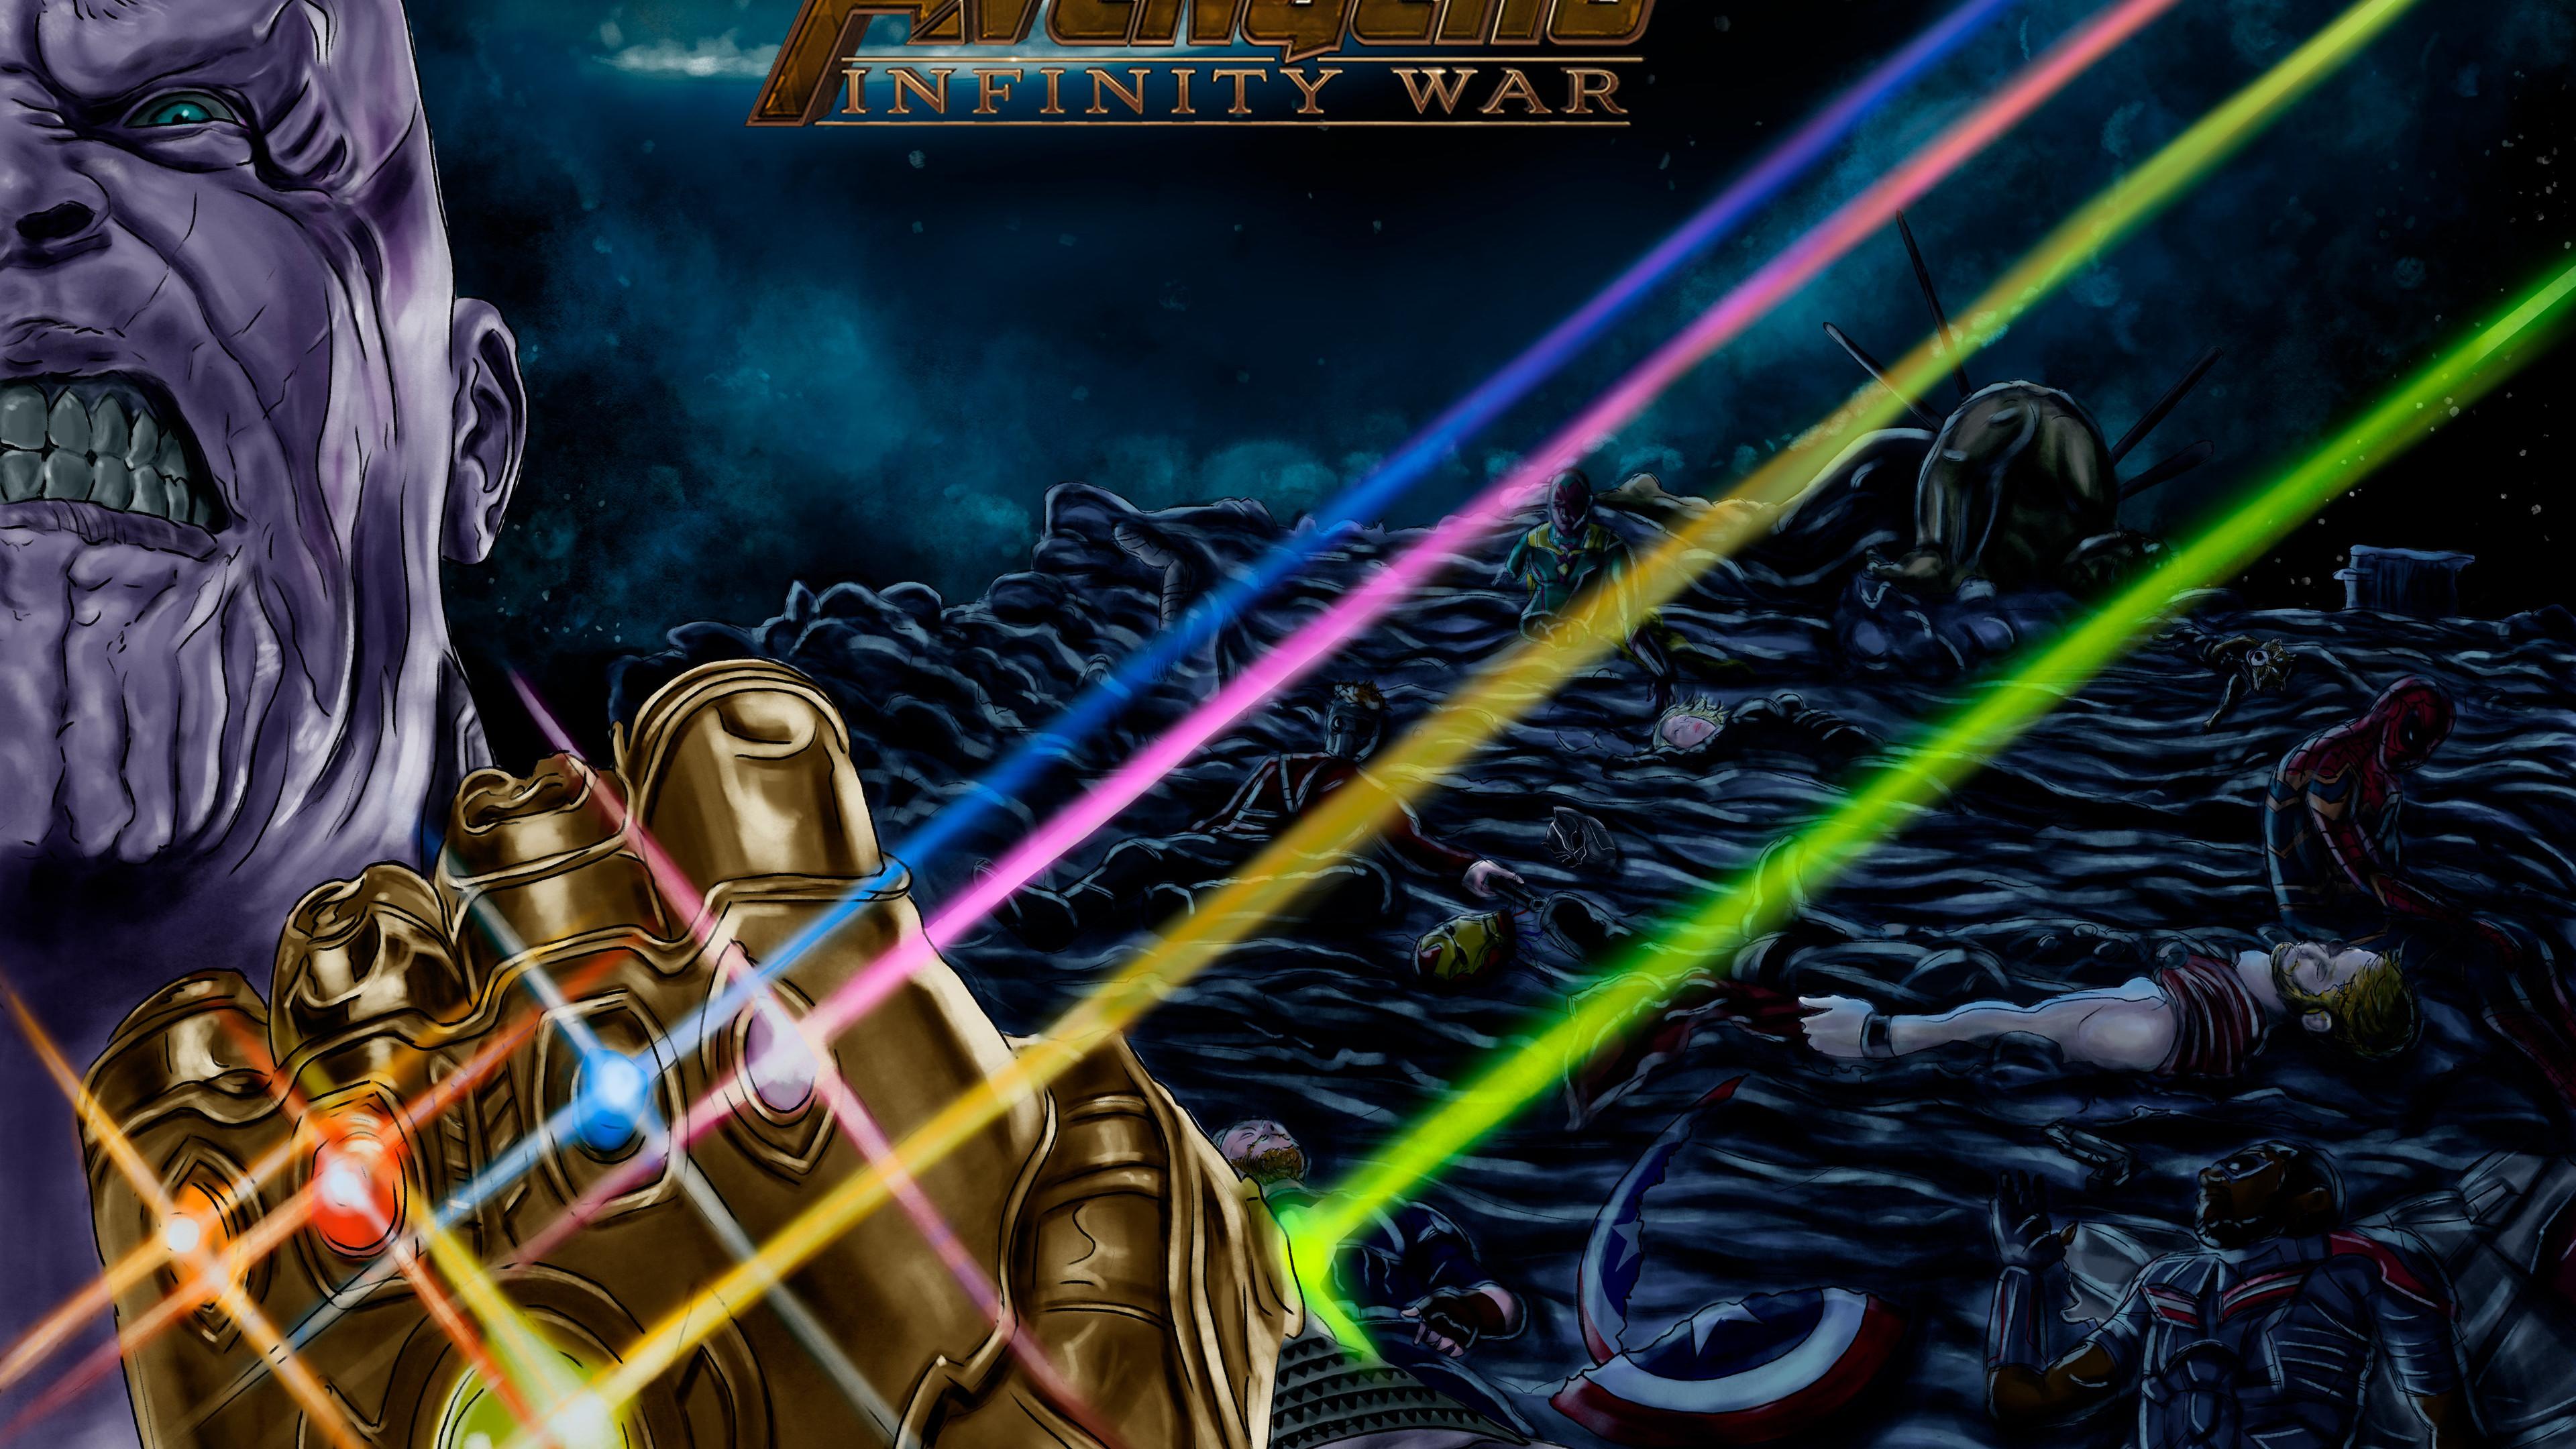 thanos always wins 1536524106 - Thanos Always Wins - thanos-wallpapers, supervillain wallpapers, superheroes wallpapers, hd-wallpapers, digital art wallpapers, behance wallpapers, artwork wallpapers, 4k-wallpapers